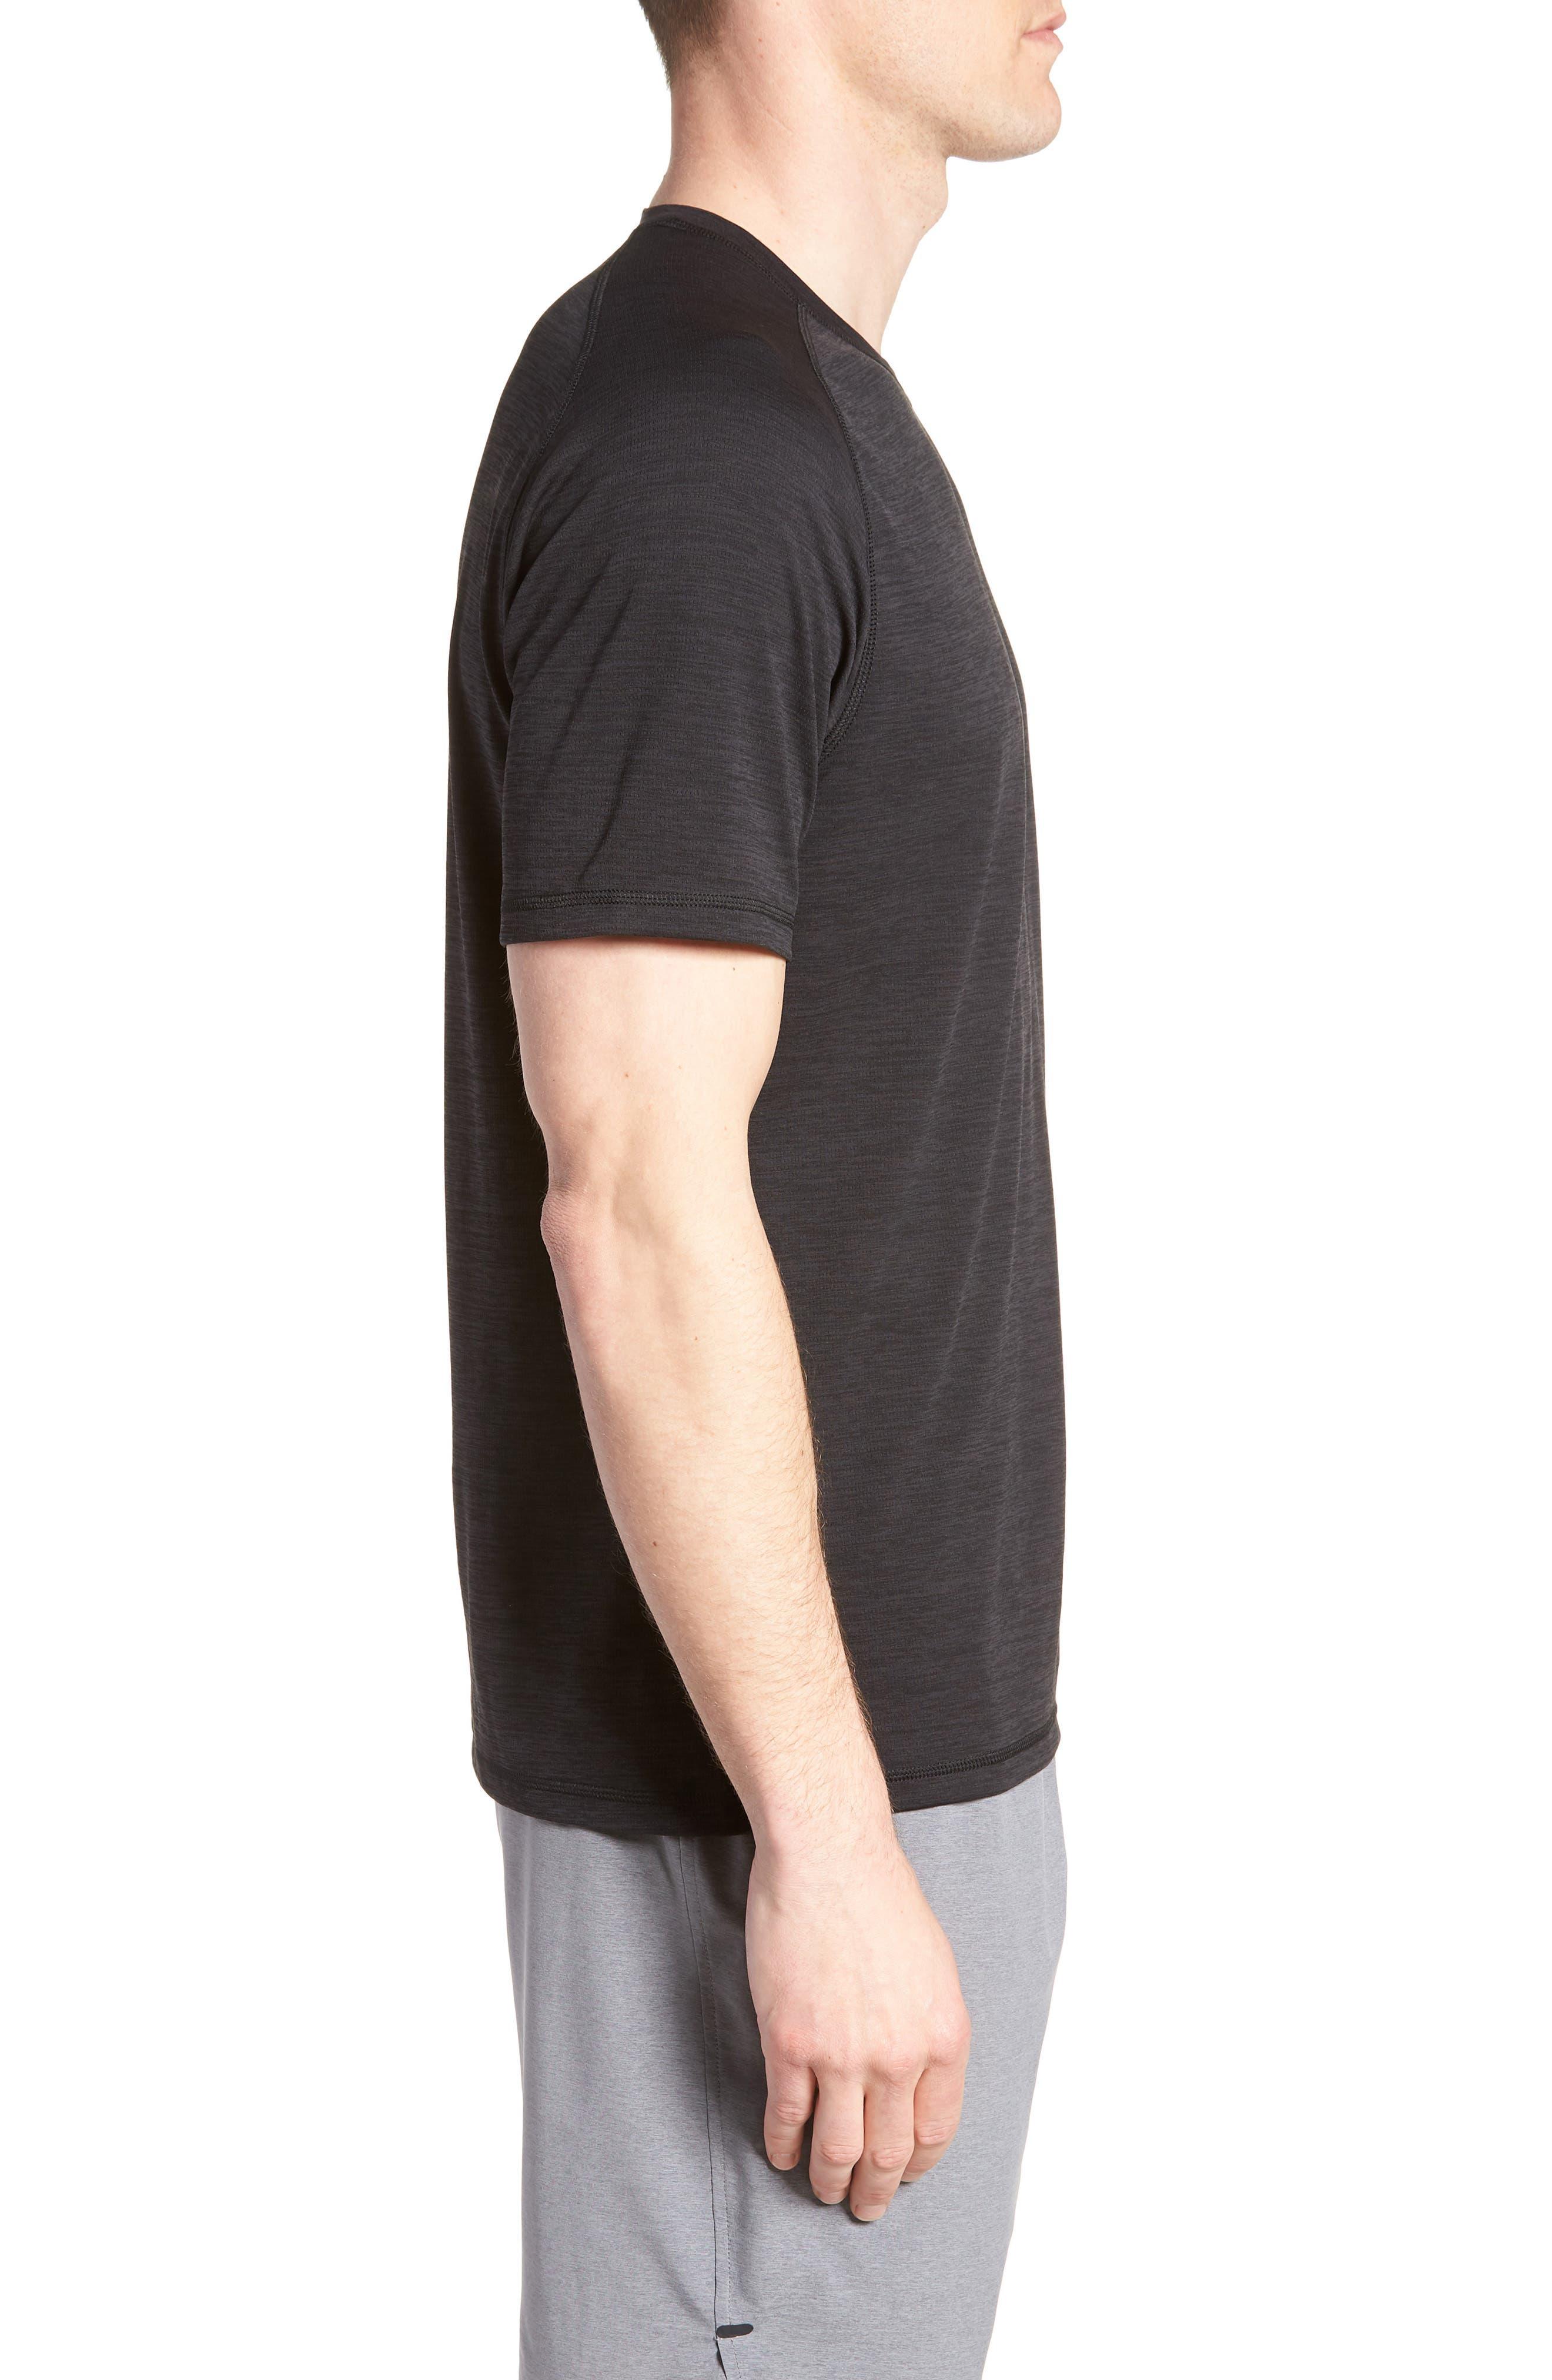 ZELLA, Kinoite Raglan Crewneck T-Shirt, Alternate thumbnail 4, color, BLACK OXIDE MELANGE